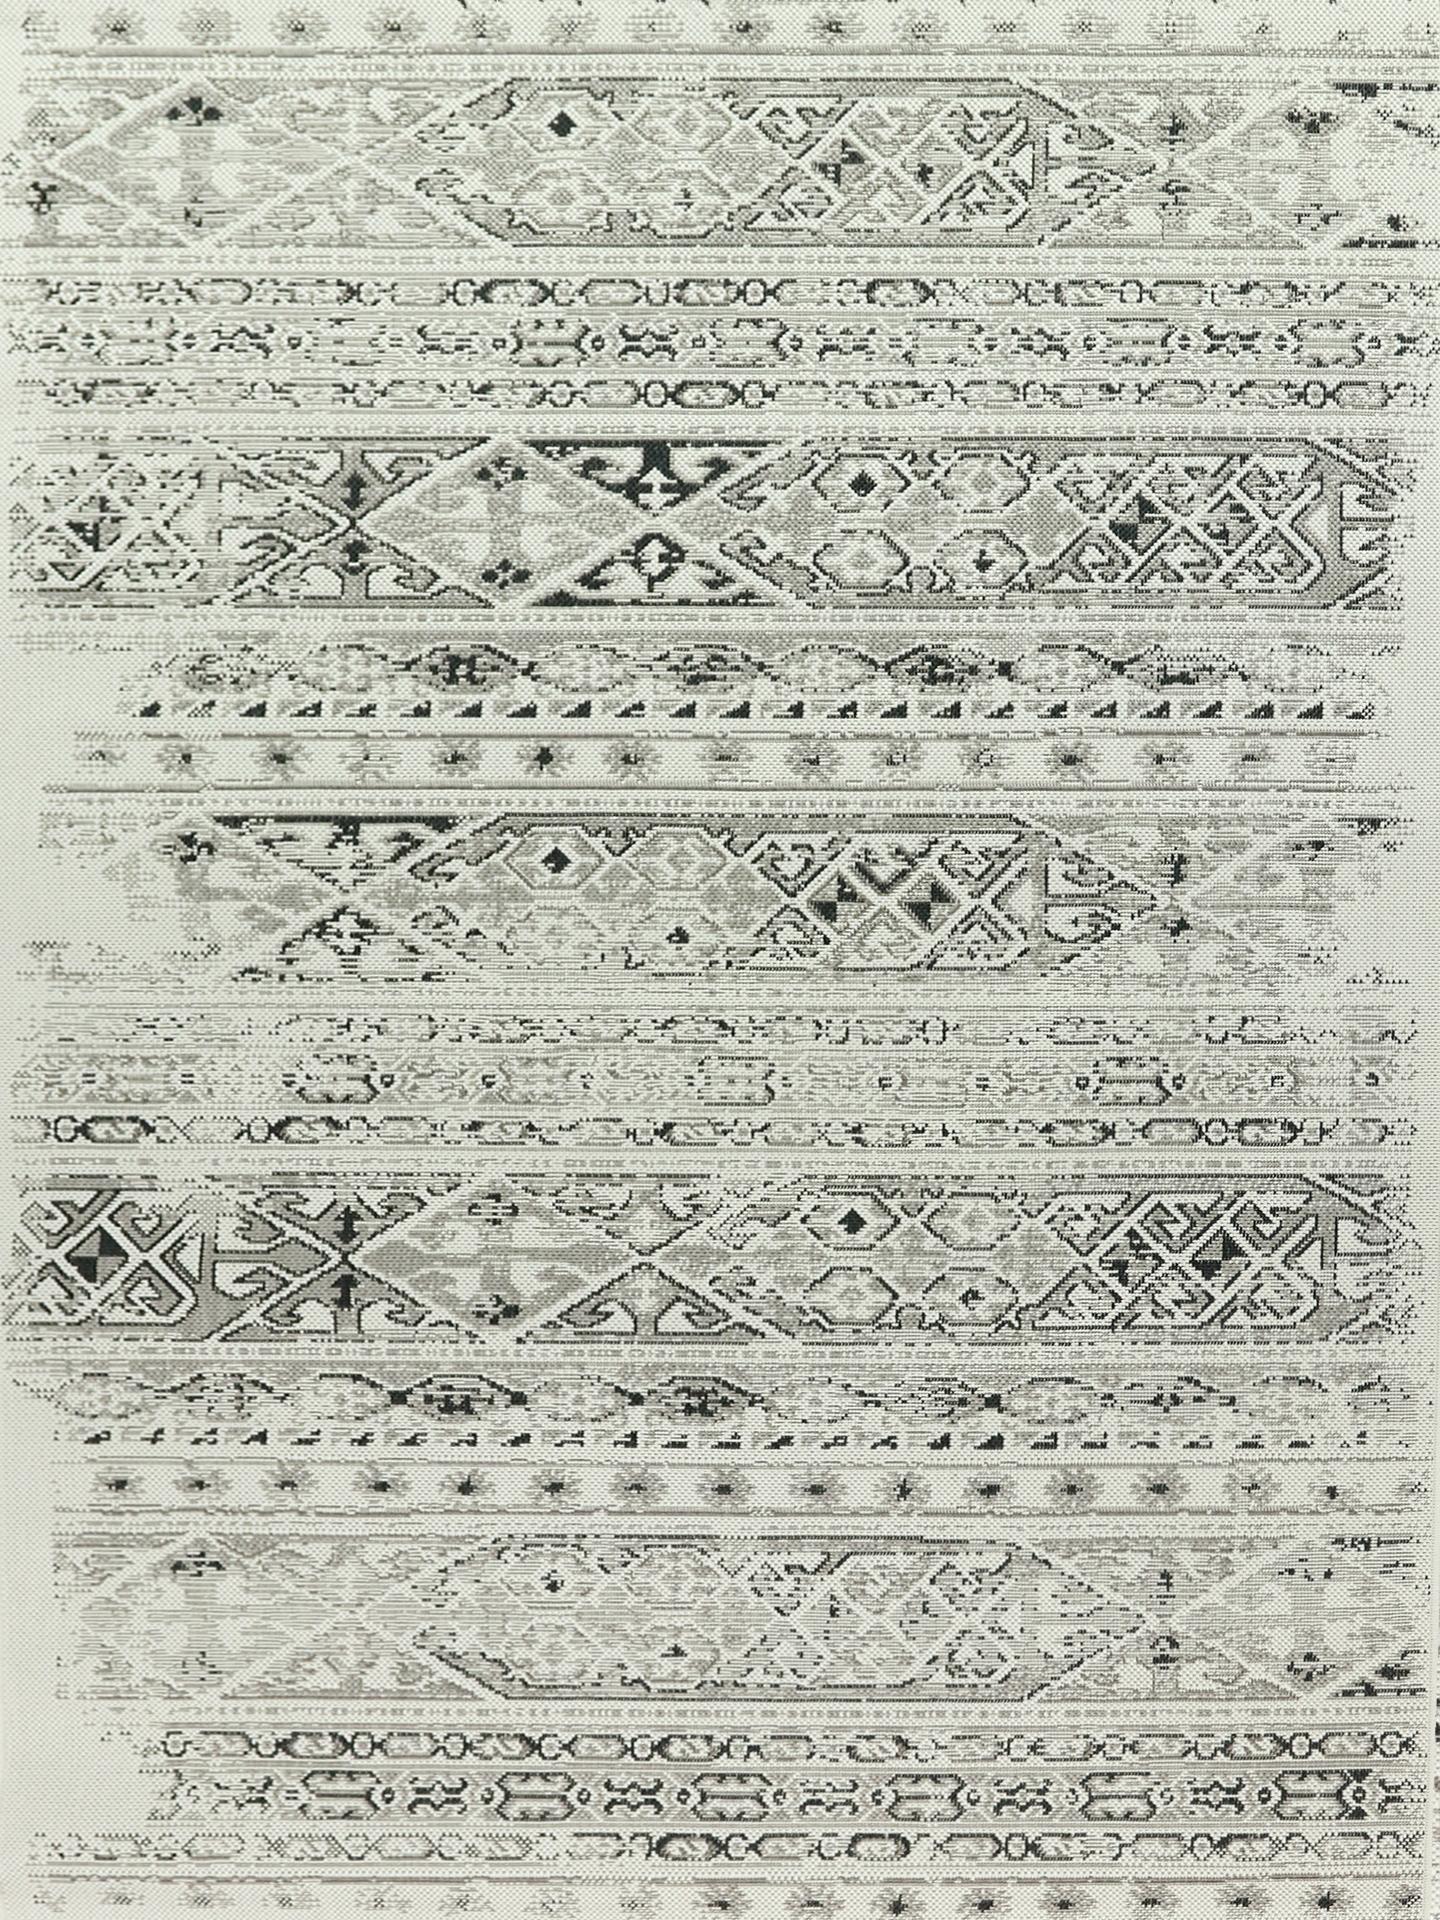 Koberec PASTELOVÉ KOBEREC, ÚROVEŇ 120x170 ŠKANDINÁVSKYCH